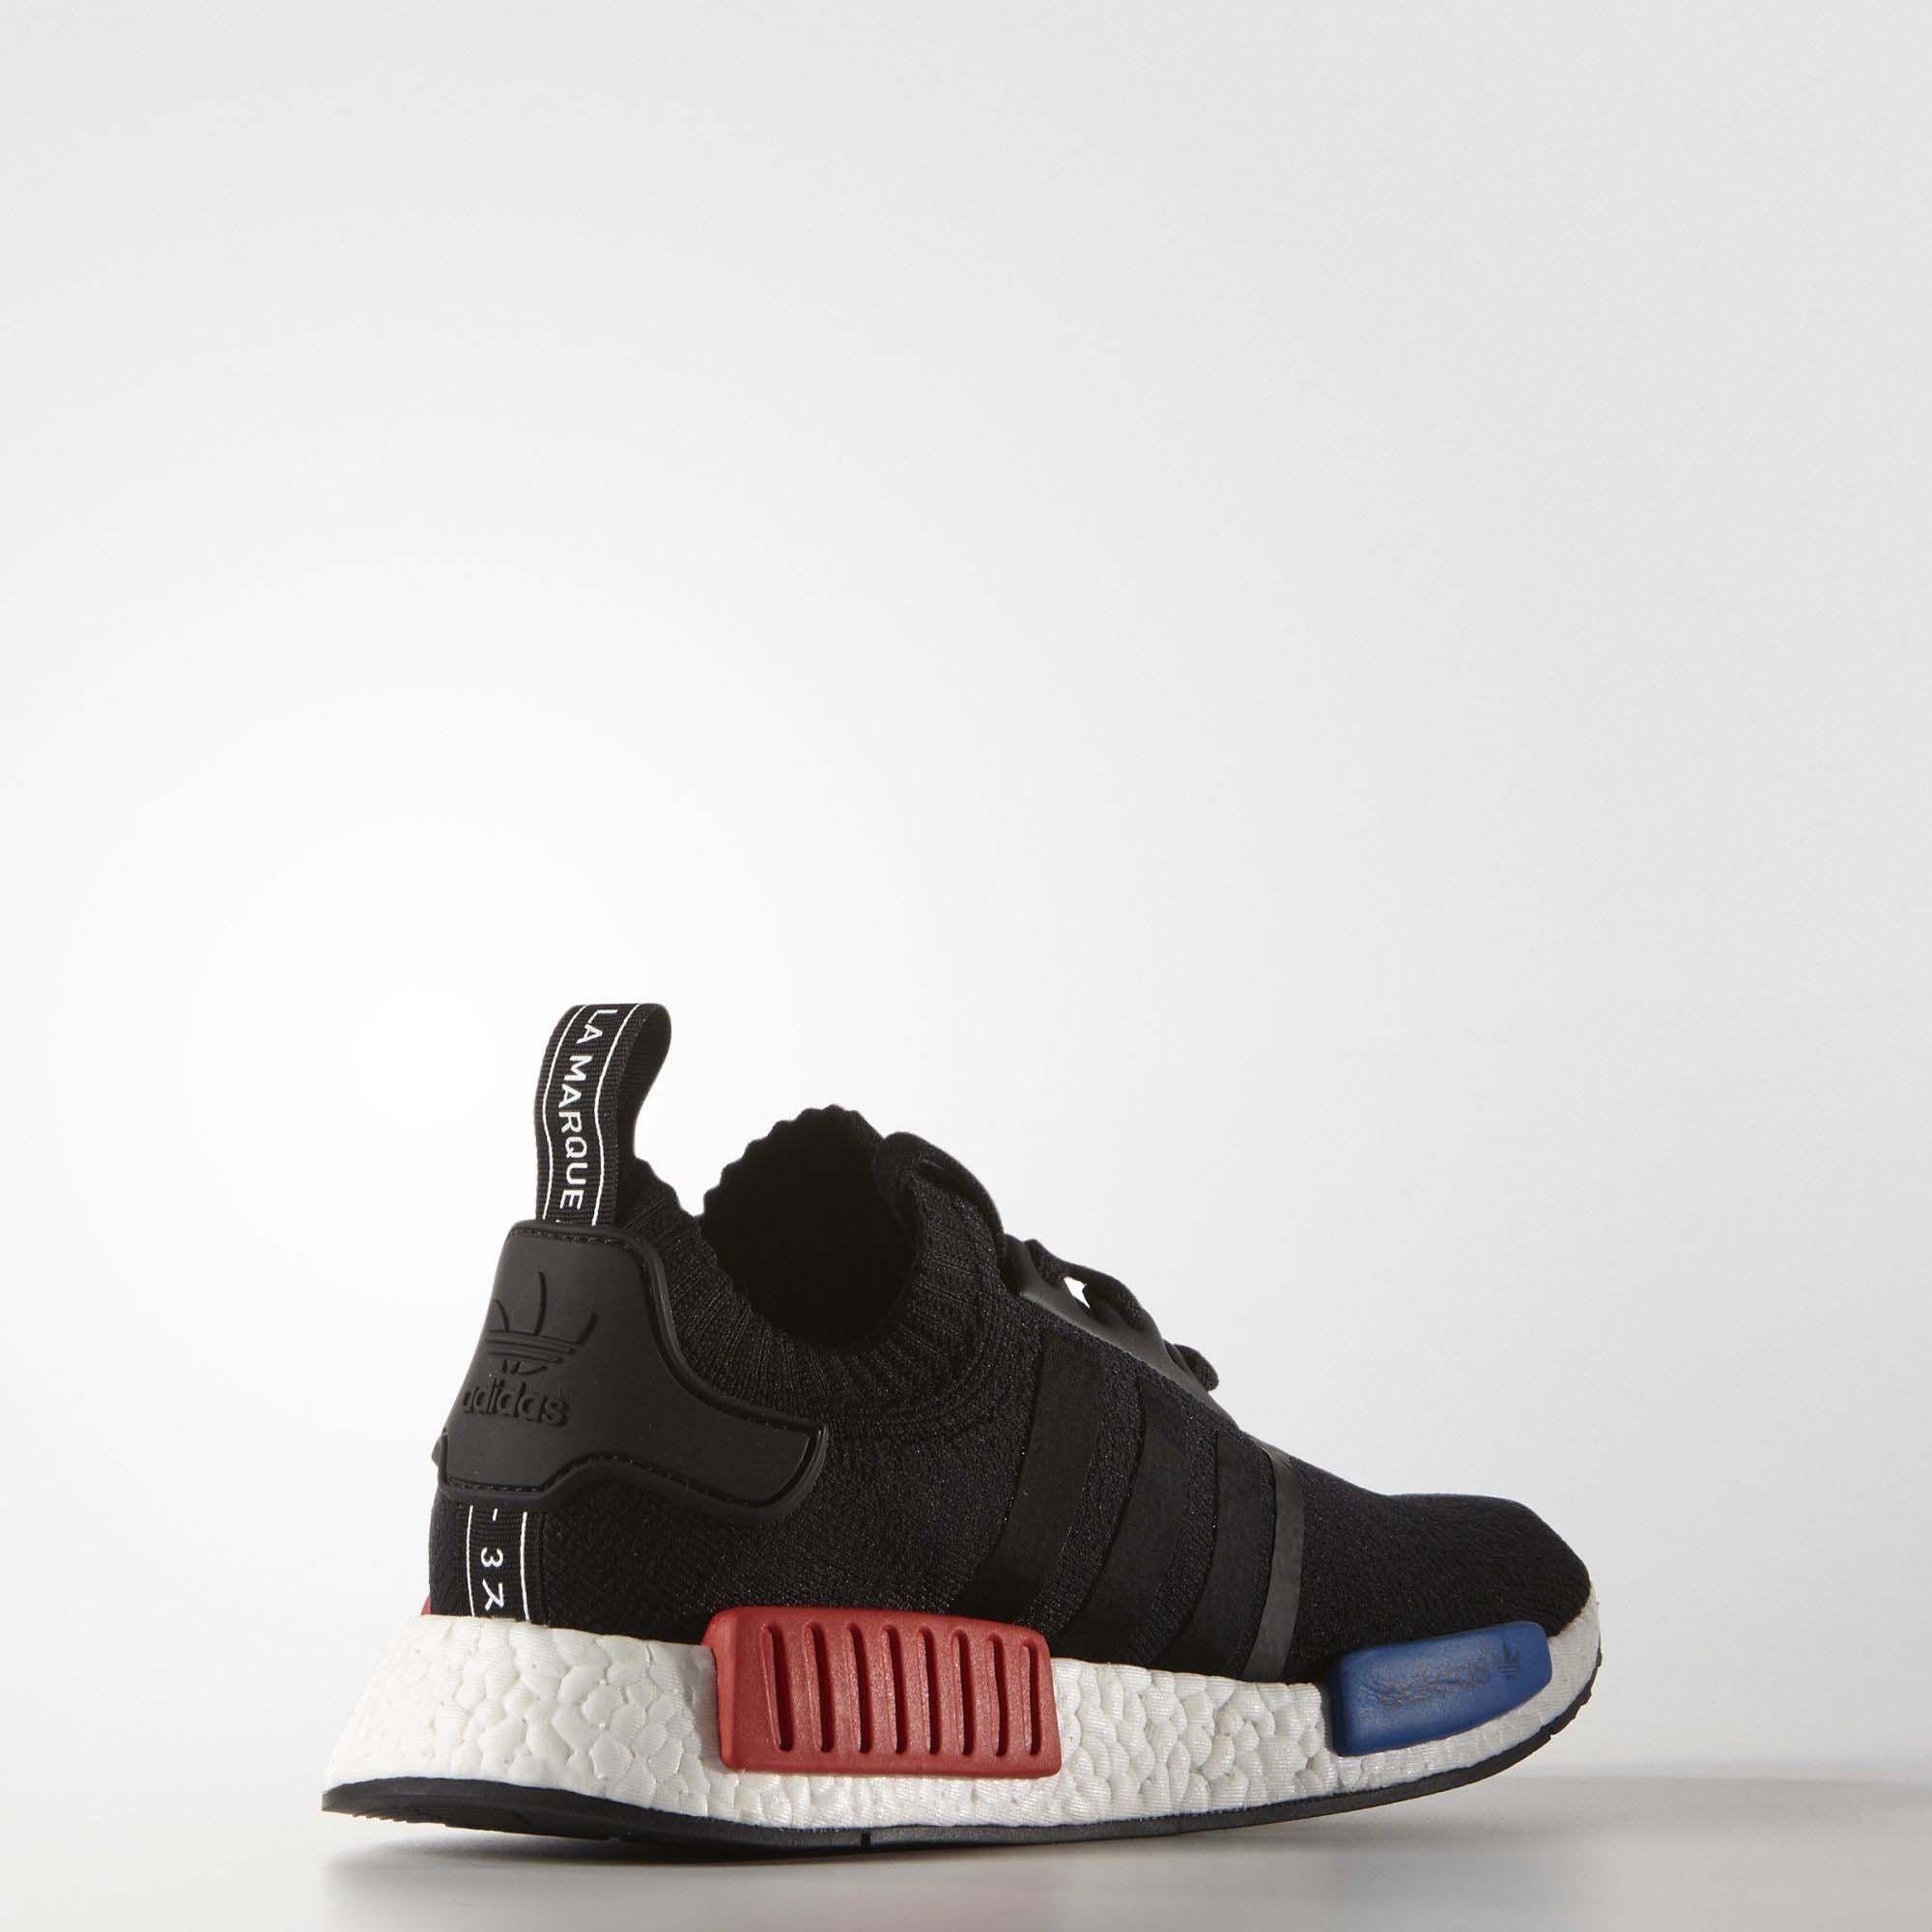 adidas nmd r1 primeknit mens kern blackcore blacklush red0 über die